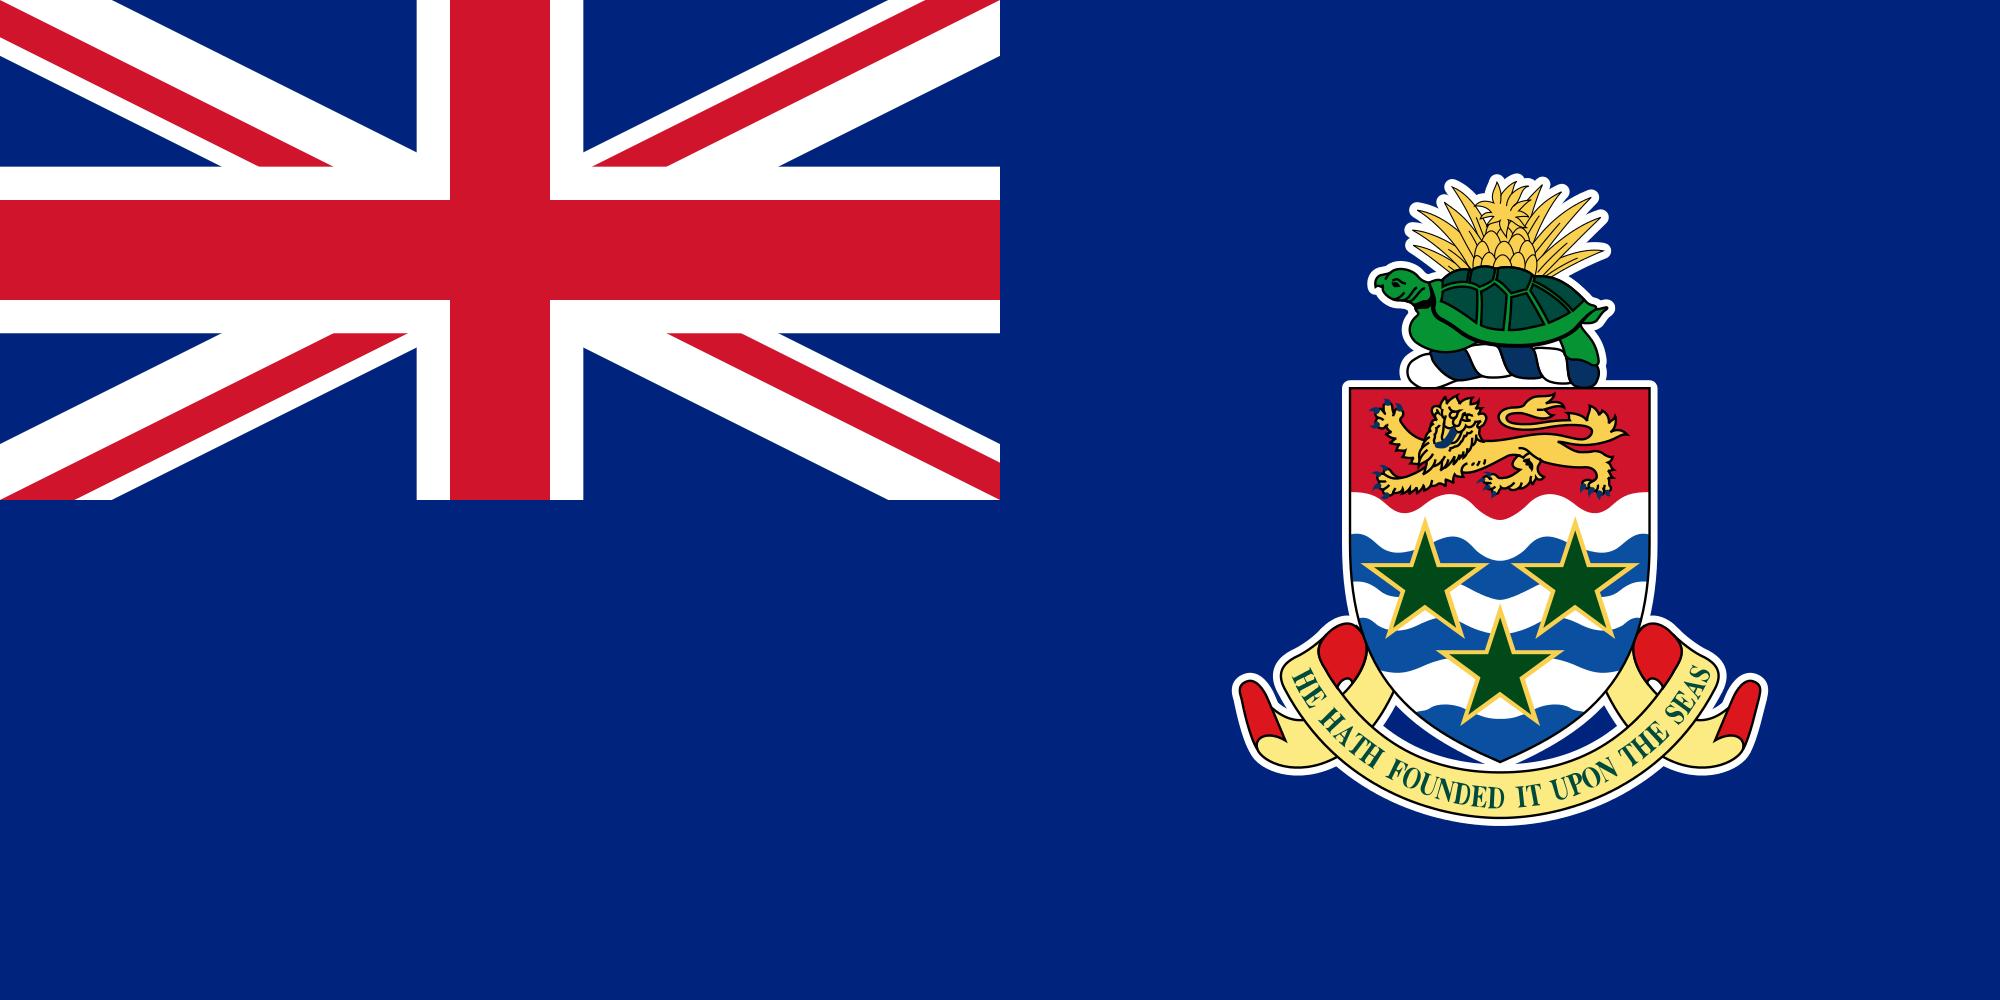 islas caimán, paese, emblema, logo, simbolo - Sfondi HD - Professor-falken.com